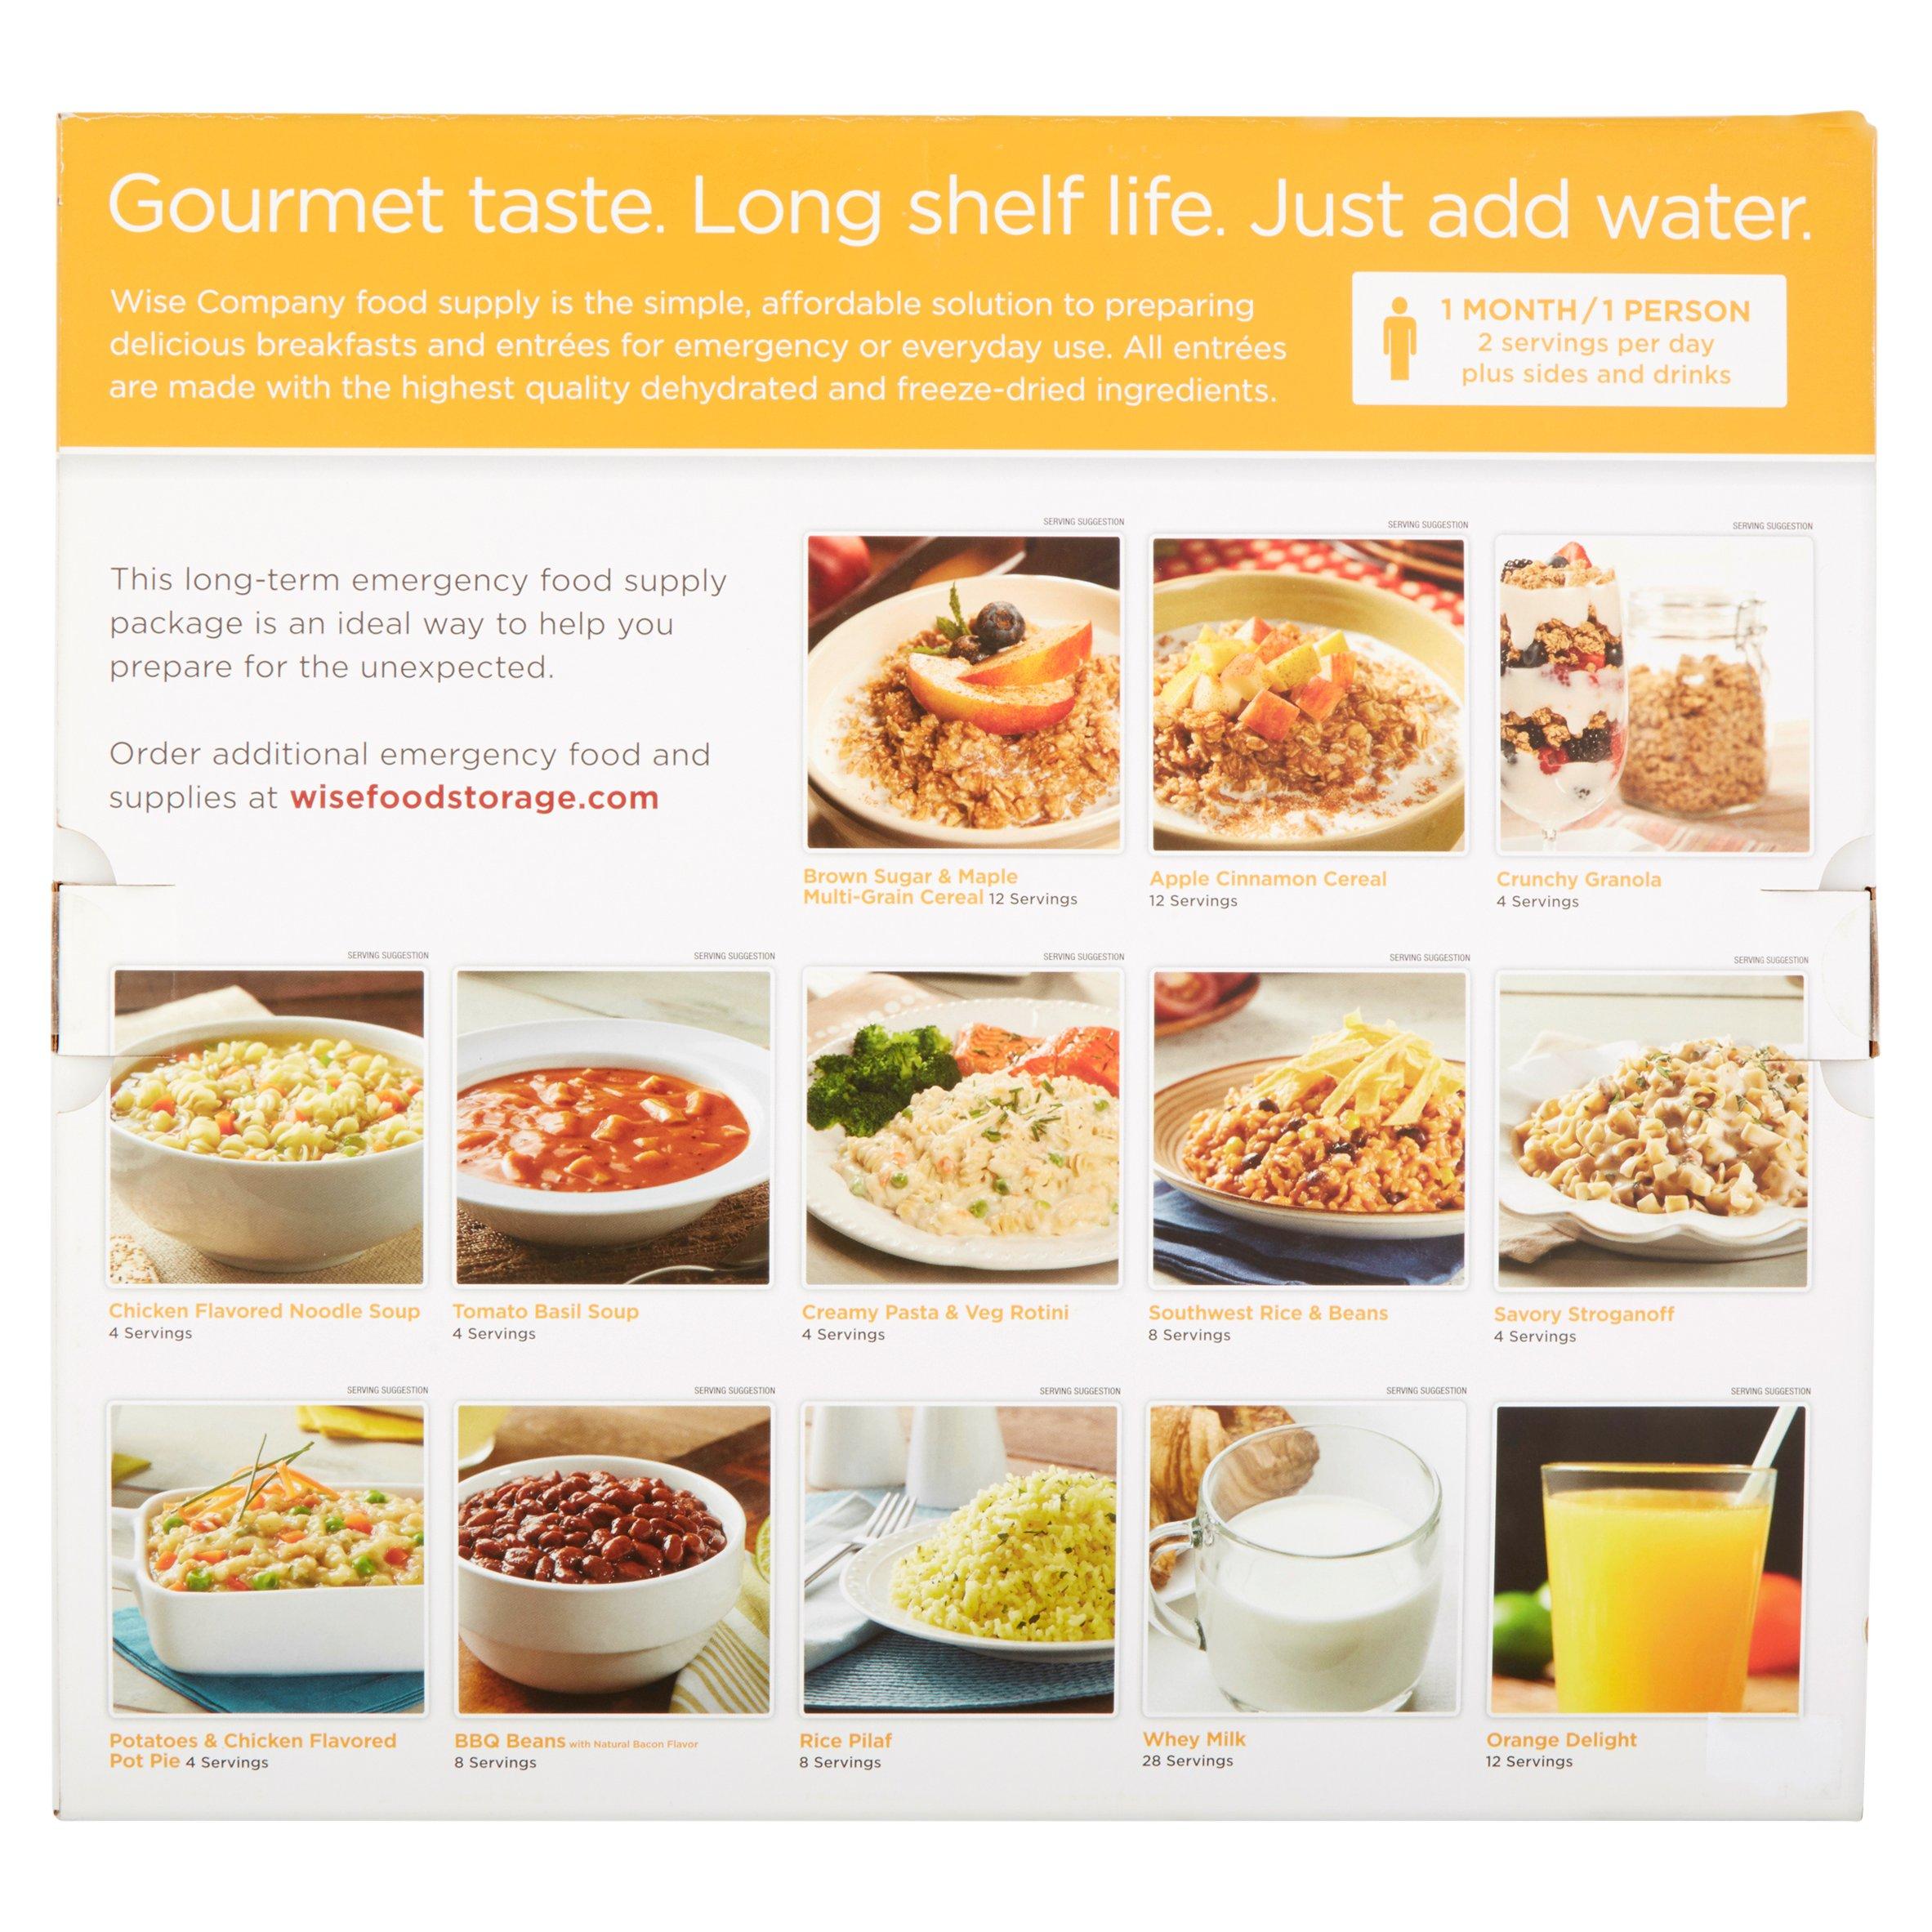 sc 1 st  Walmart & Wise Foods 1 Month Supply Pack (112 Servings) - Walmart.com